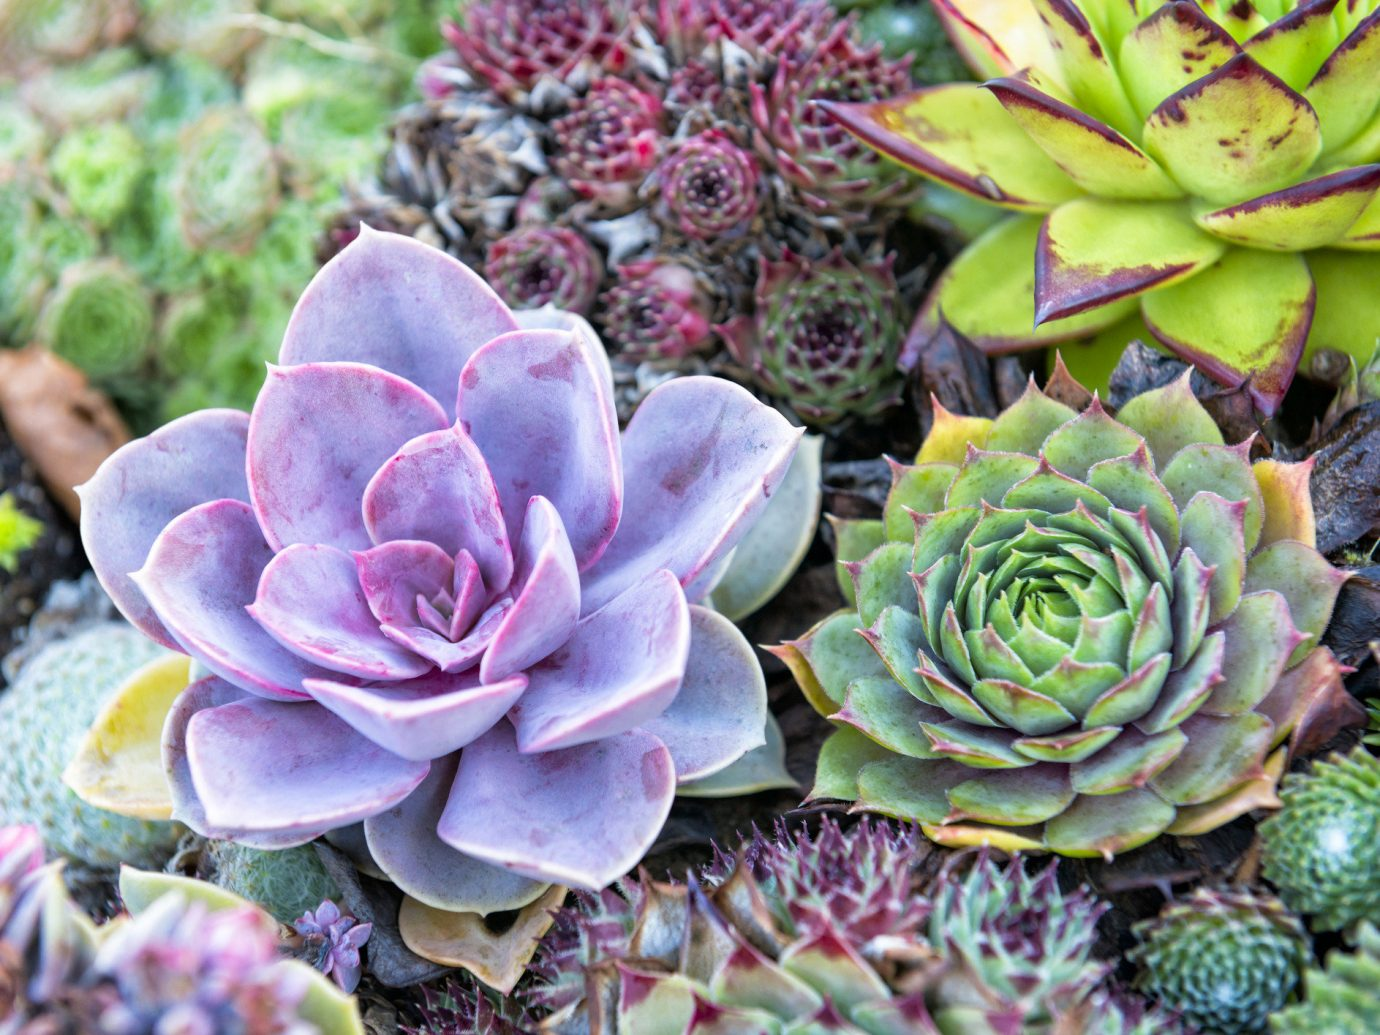 Cacti at the Moorten Botanical Garden